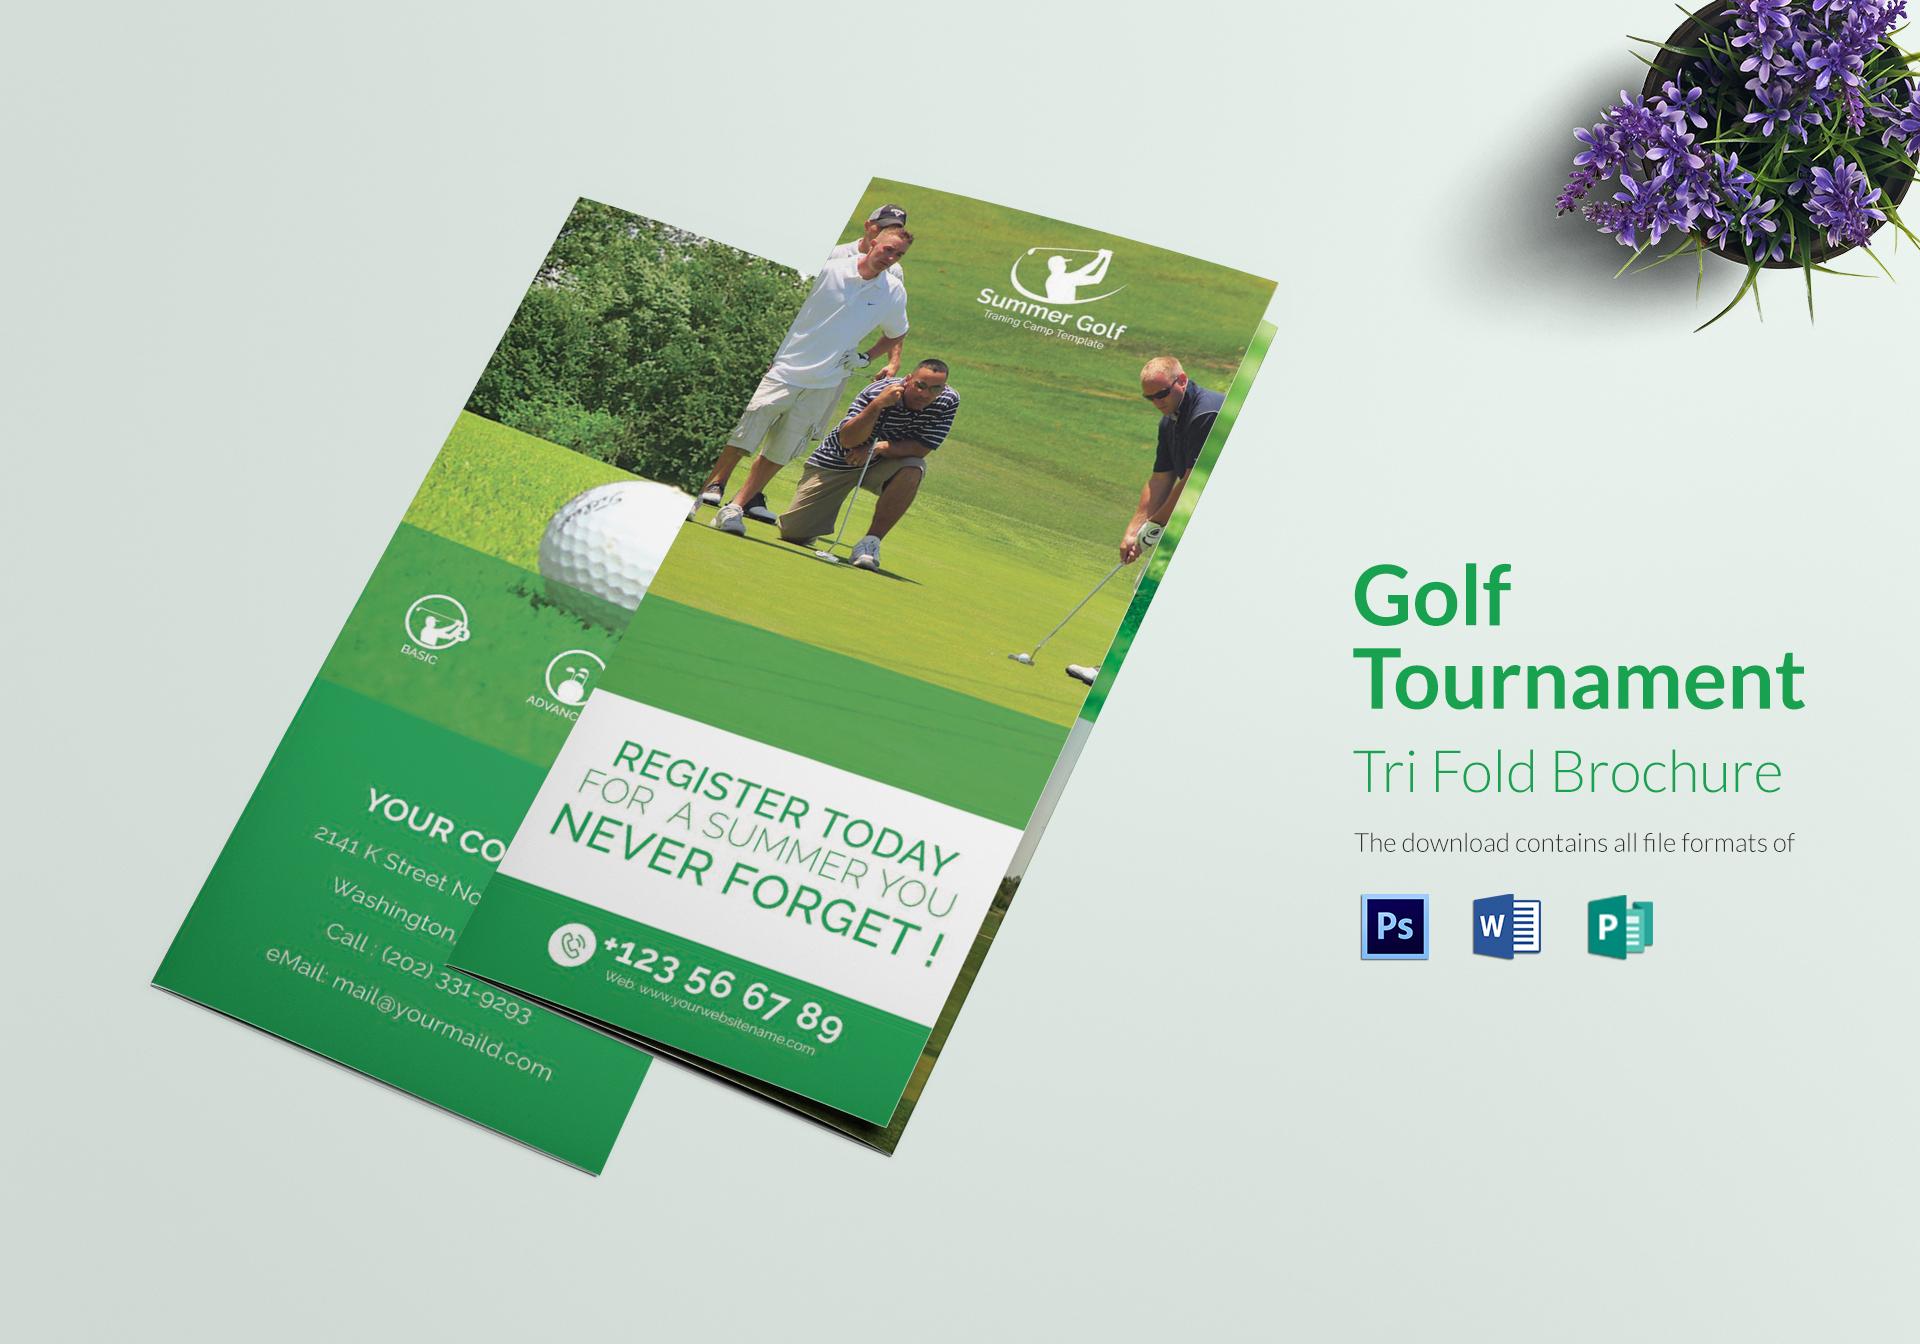 Golf Tournament Tri Fold Brochure Design Template In Word Psd